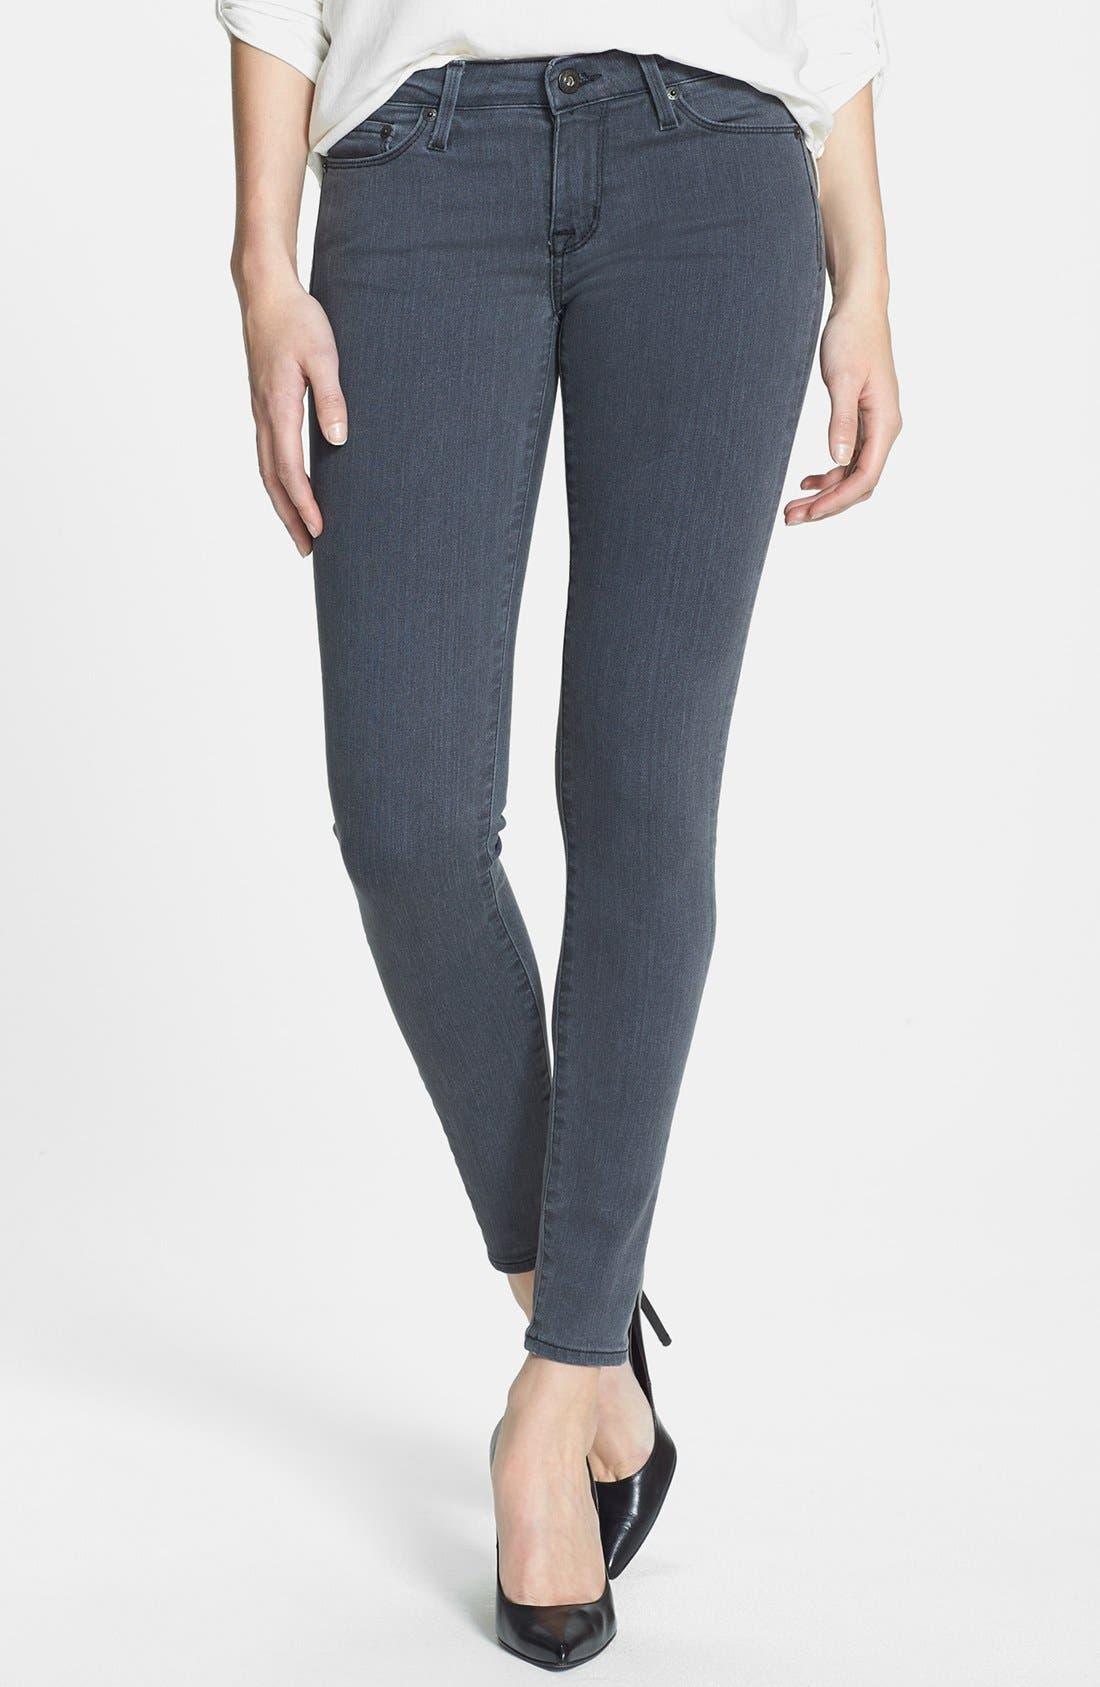 Alternate Image 1 Selected - Big Star 'Alex' Stretch Skinny Jeans (Liverpool) (Petite)